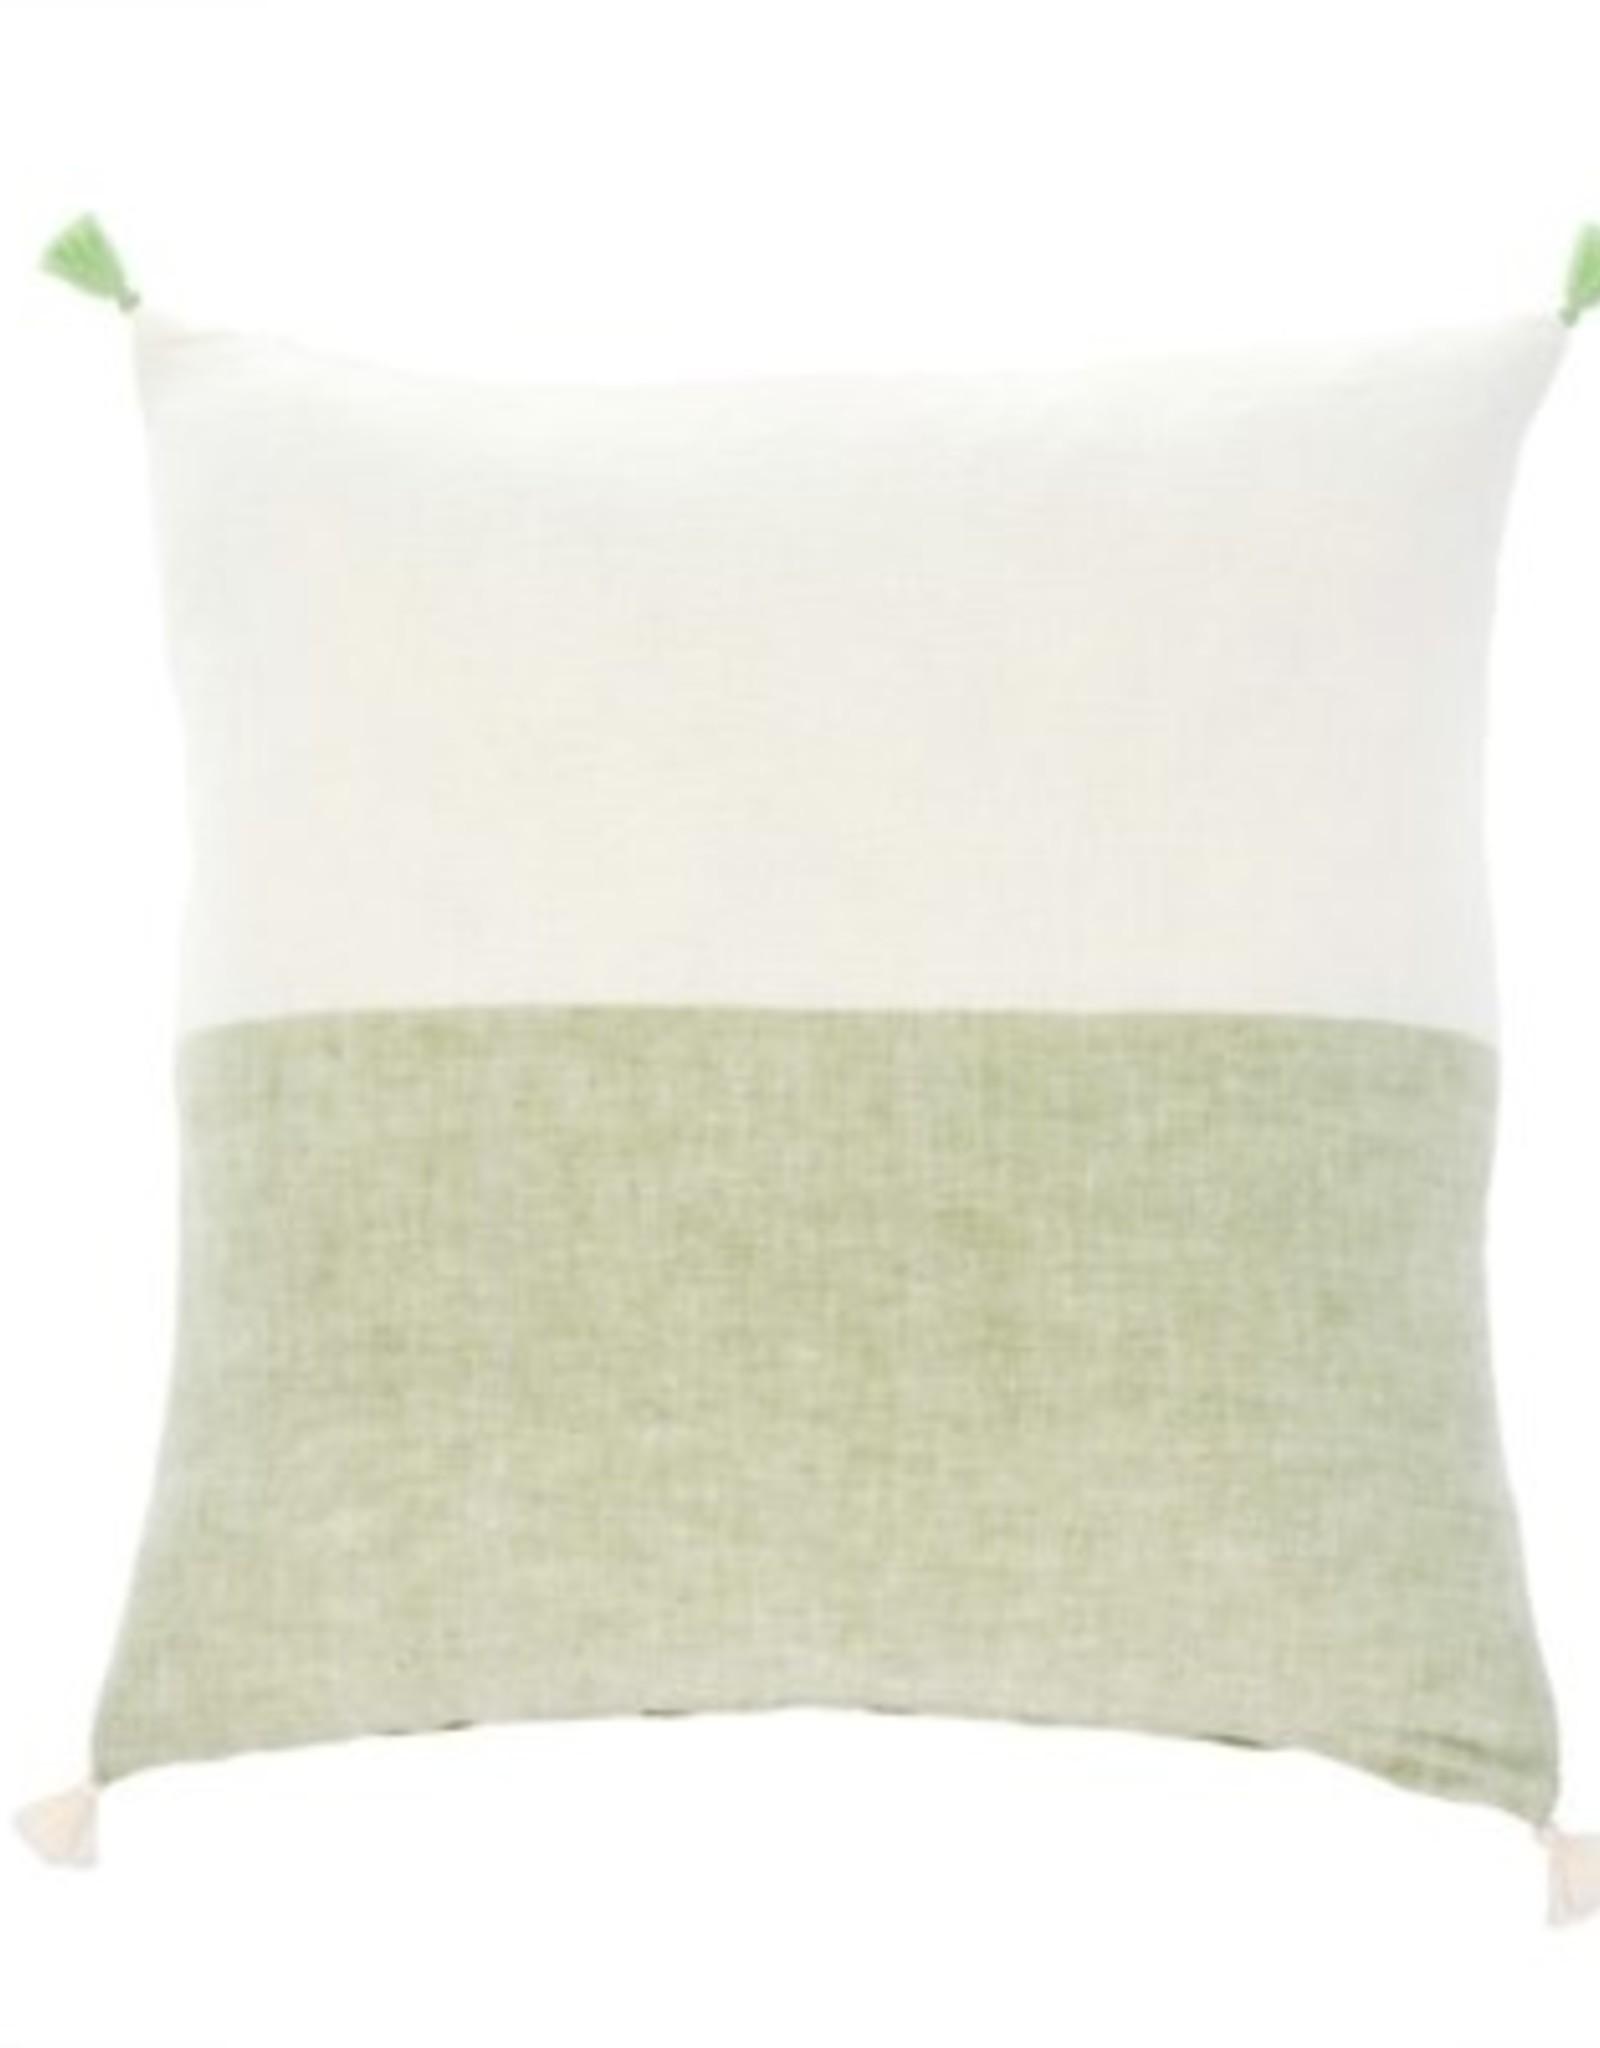 Indaba Cushions Indaba Layla Linen Green 20 x 20